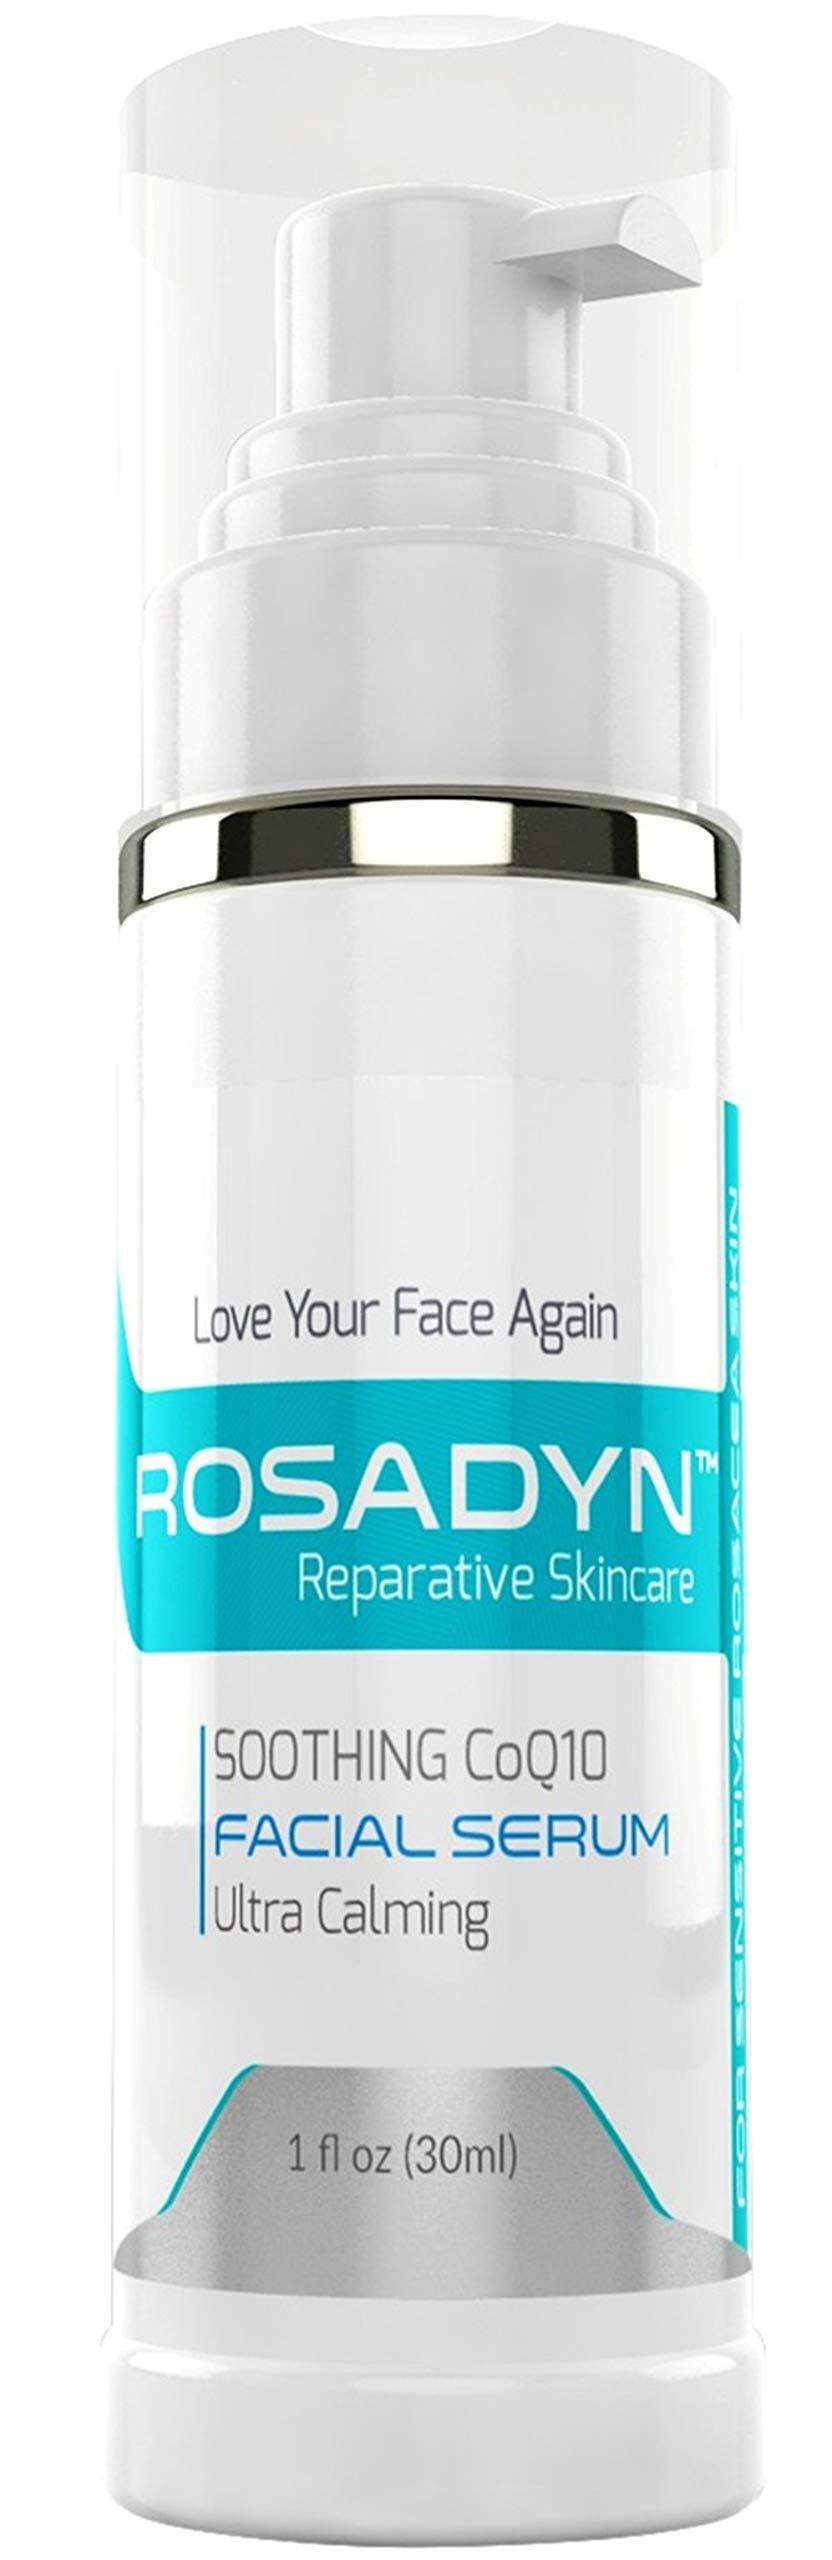 Rosacea Cream Sensitive Serum Rosadyn